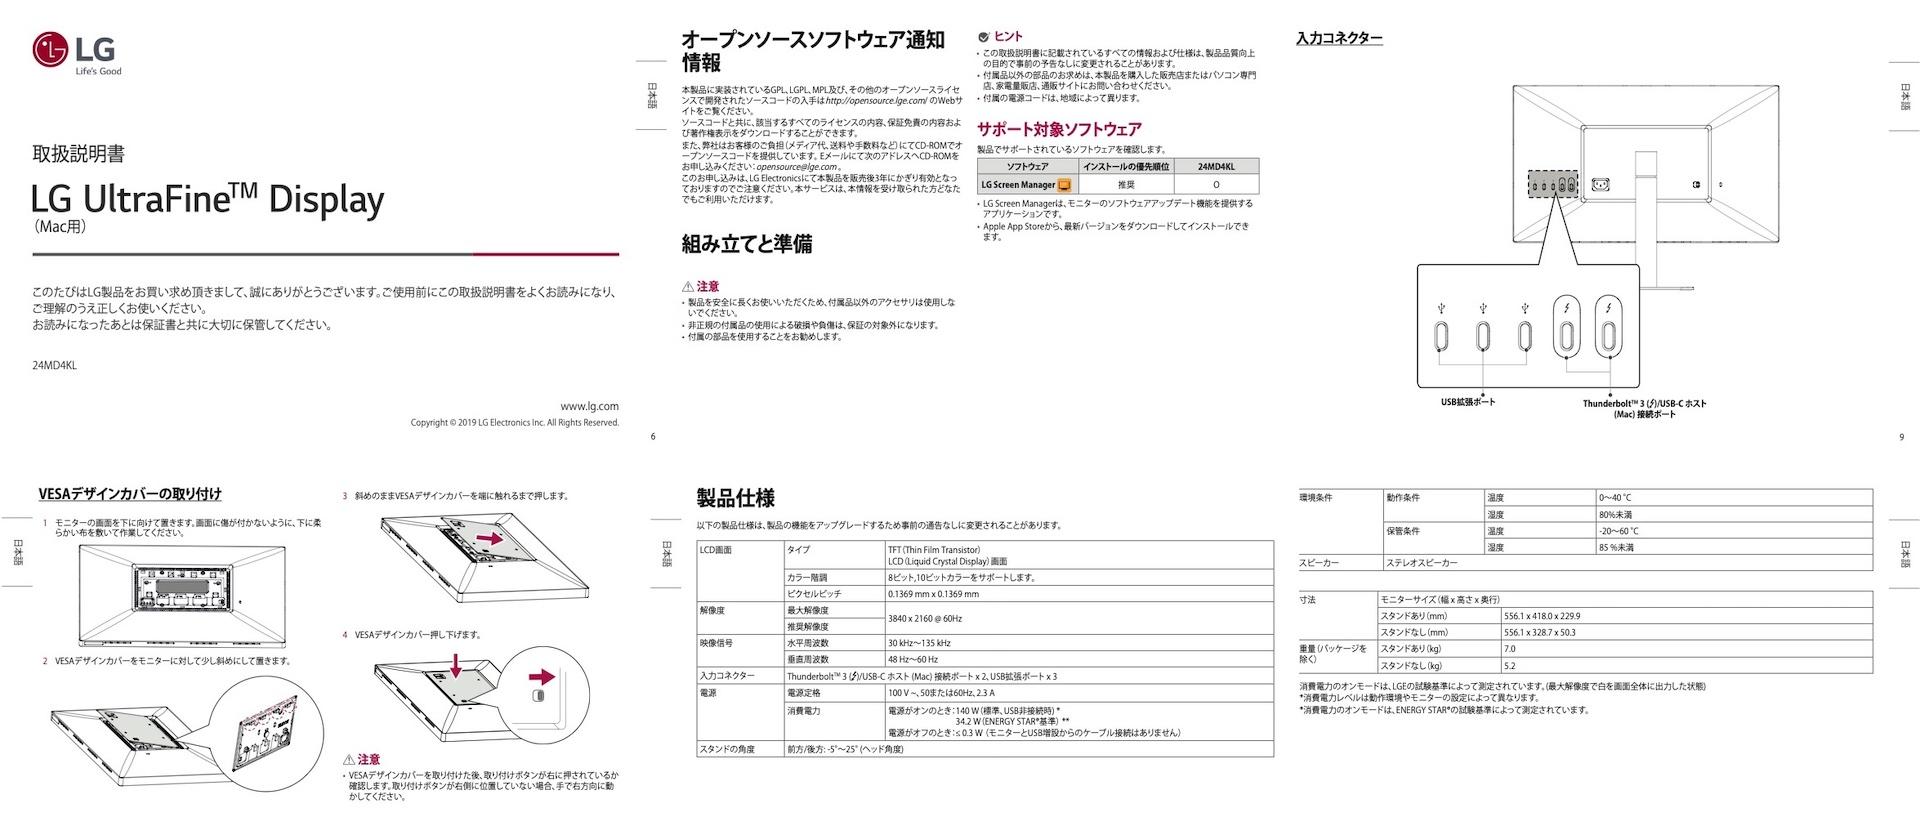 LG UltraFine 4K Display のマニュアル